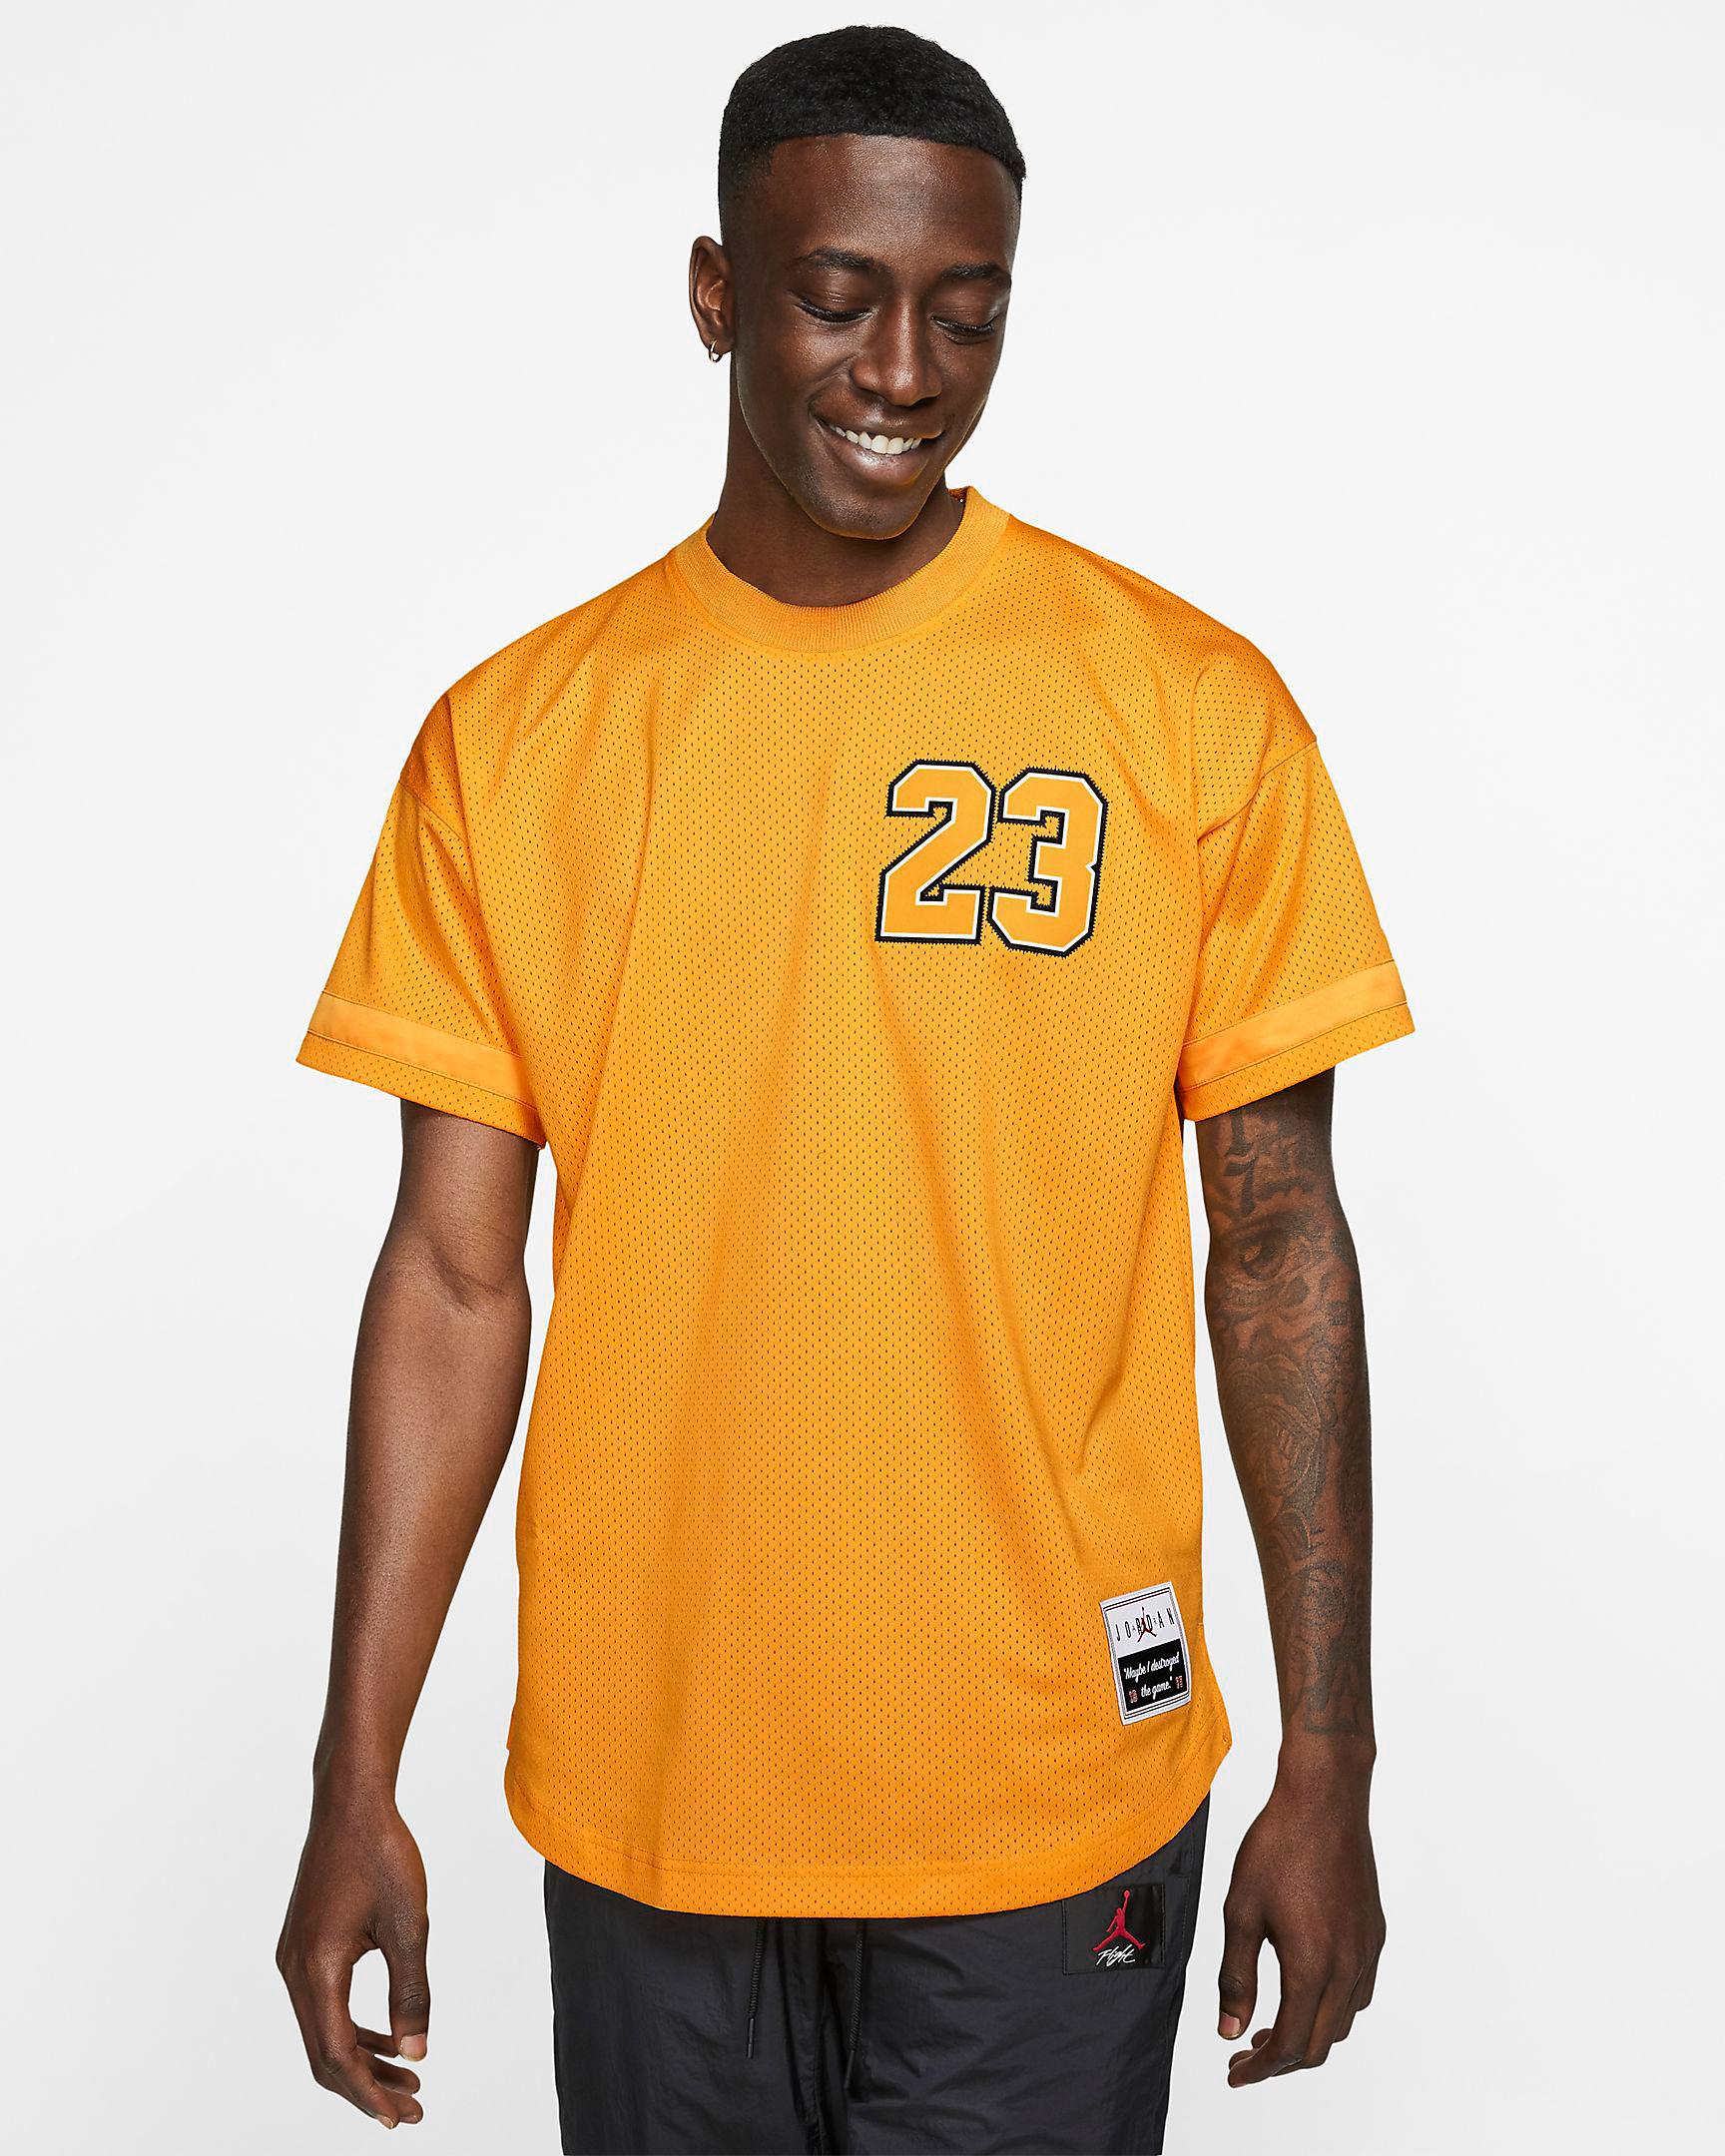 Air Jordan 13 Lakers Matching Shirts